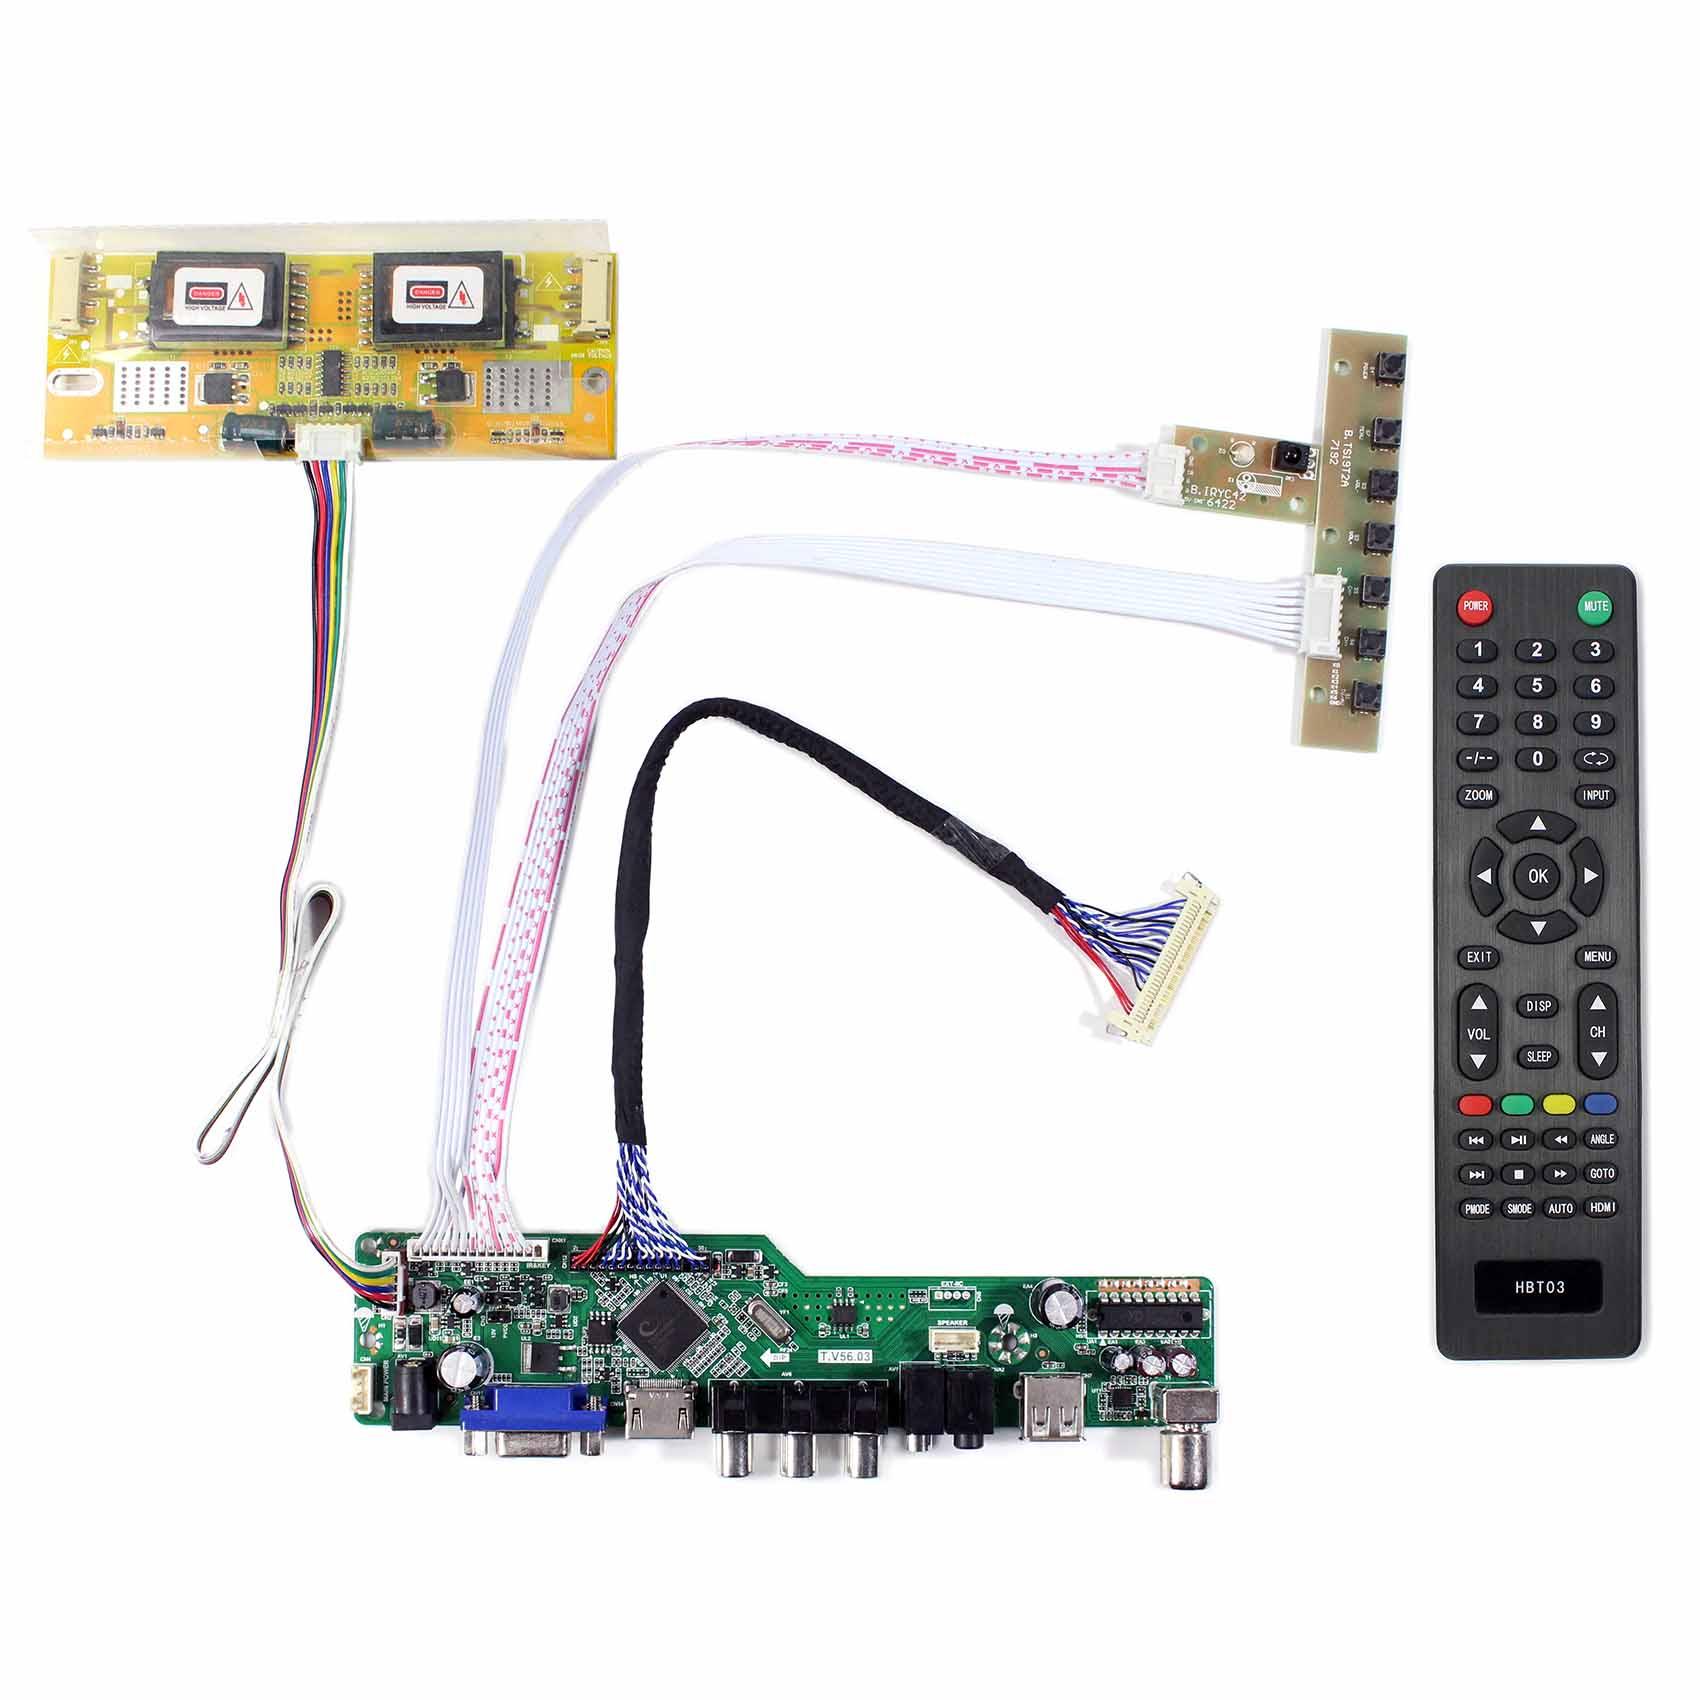 HDMI VGA LCD Controller Board USB Support Video 1280x1024 M170EN06 4CCFL Inverter Board M170EN05 for 17inch LCD ScreenHDMI VGA LCD Controller Board USB Support Video 1280x1024 M170EN06 4CCFL Inverter Board M170EN05 for 17inch LCD Screen